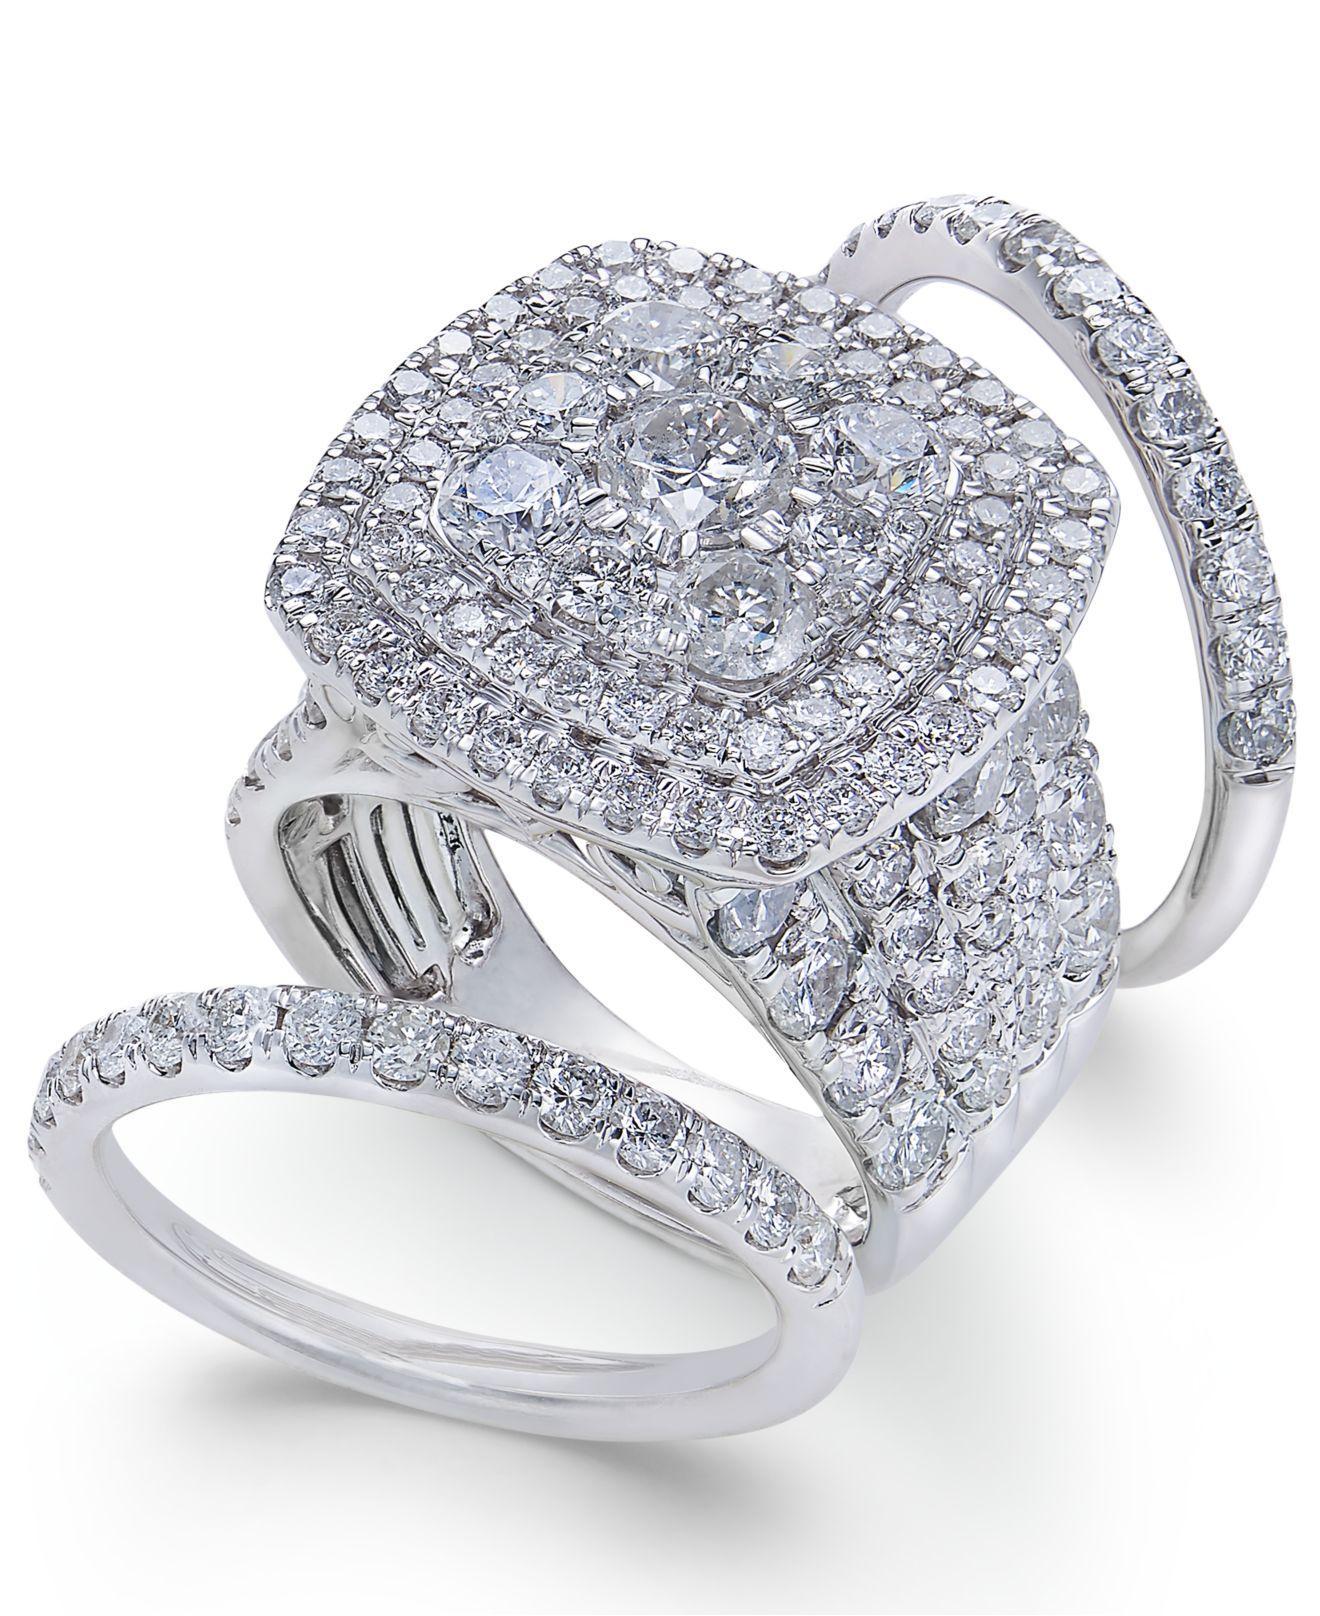 Macy s Diamond Multi level Halo Bridal Set 6 Ct T w In 14k